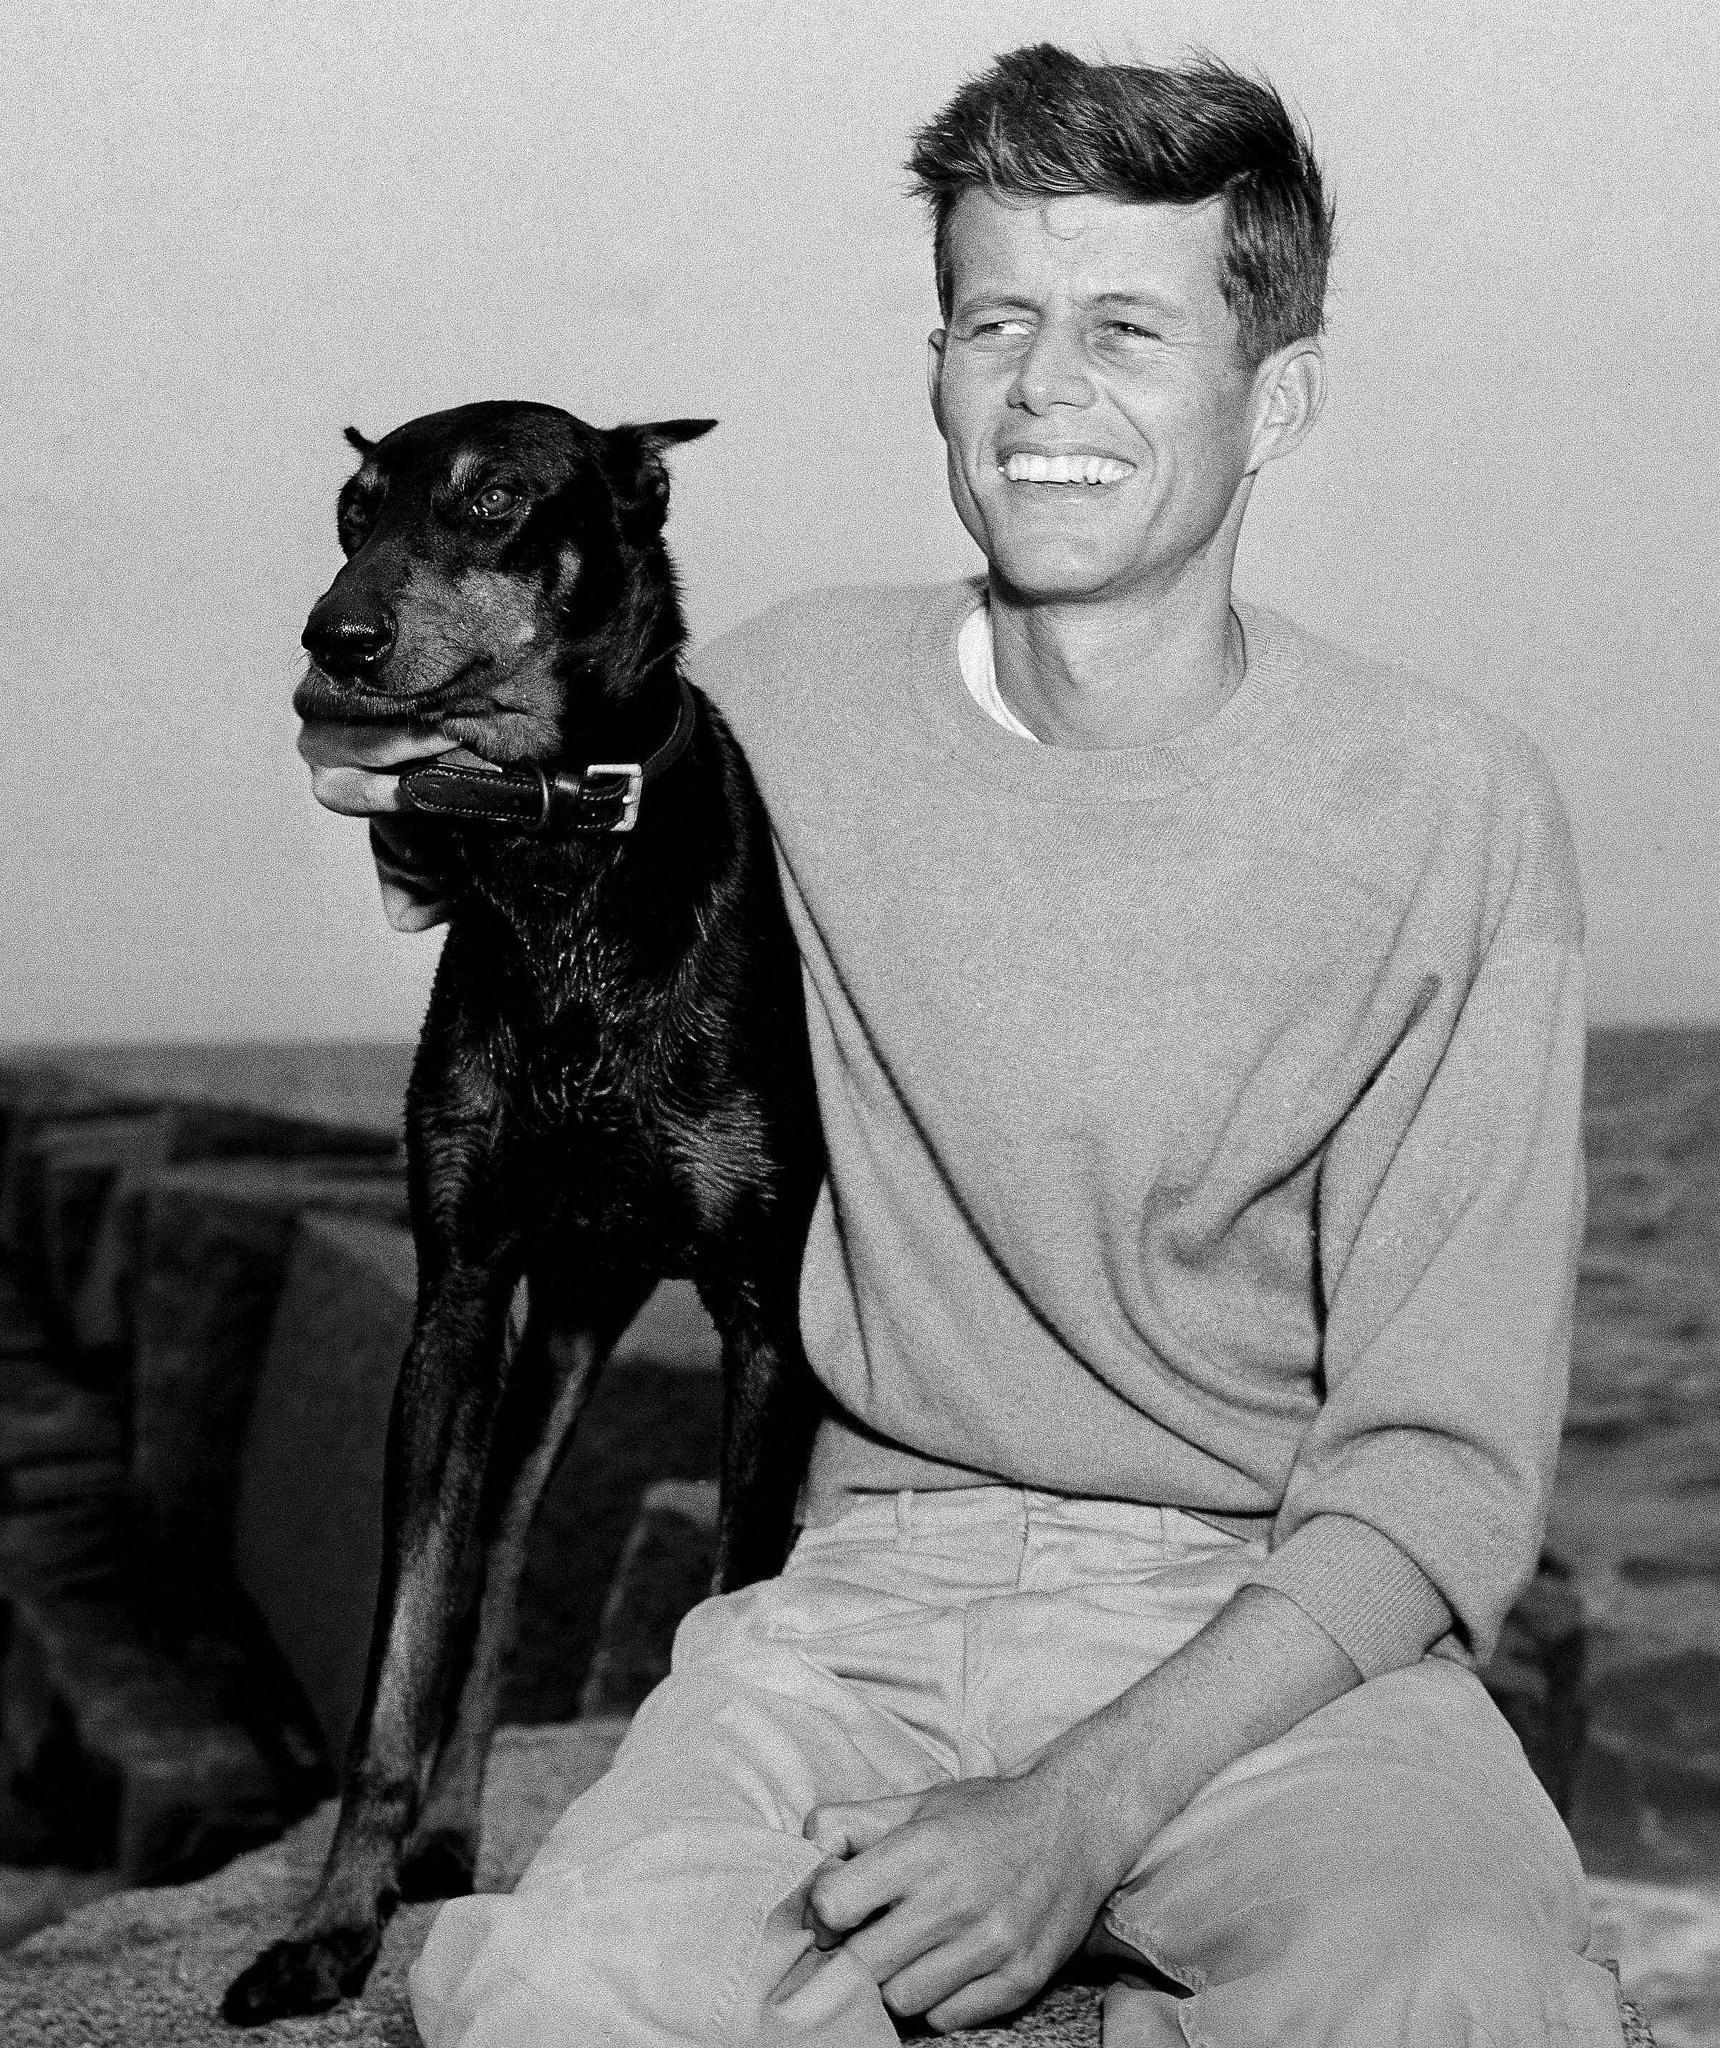 john f kennedy birthday Thousands turn out to remember JFK on 100th birthday   Chicago Tribune john f kennedy birthday